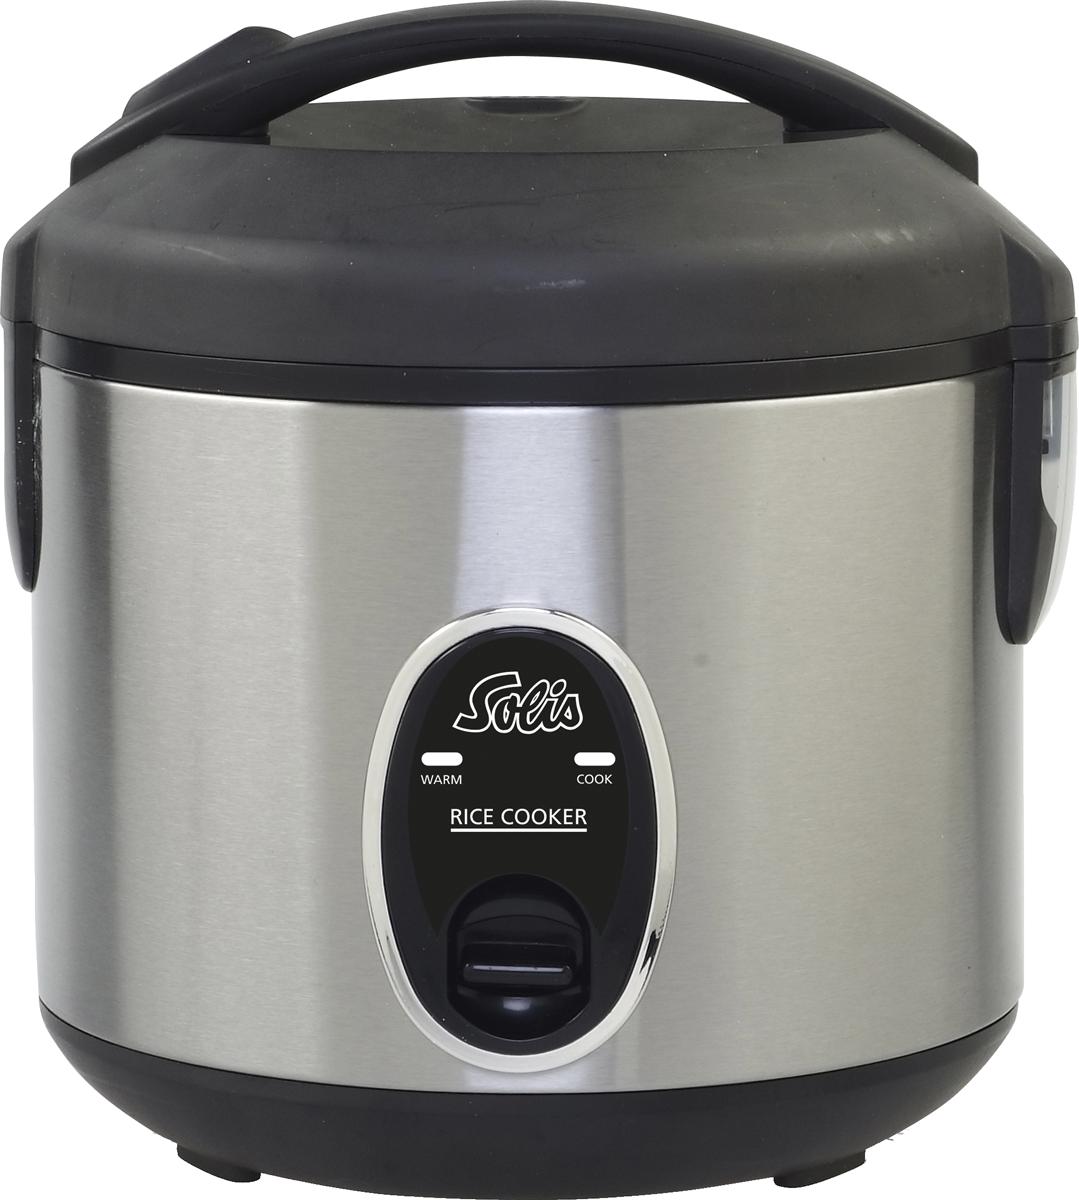 Solis rice cooker 2 in 1 cuiseur riz acheter bas - Cuisiner avec un rice cooker ...